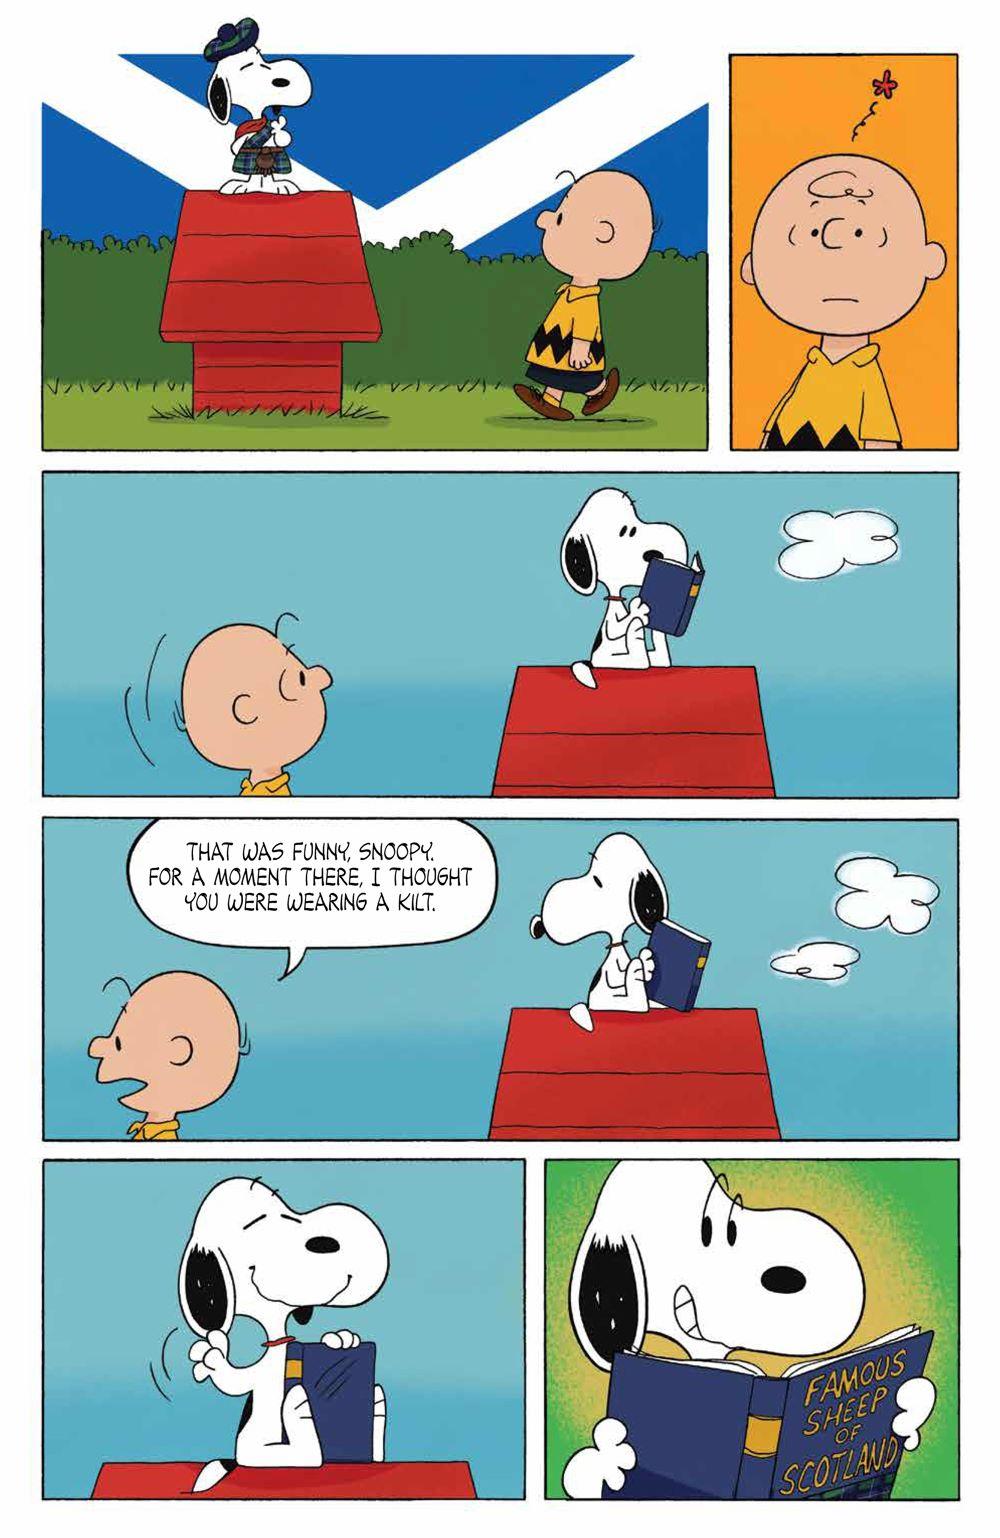 Peanuts_OGN_ScotlandBound_SC_PRESS_17 ComicList Previews: PEANUTS SCOTLAND BOUND CHARLIE BROWN GN